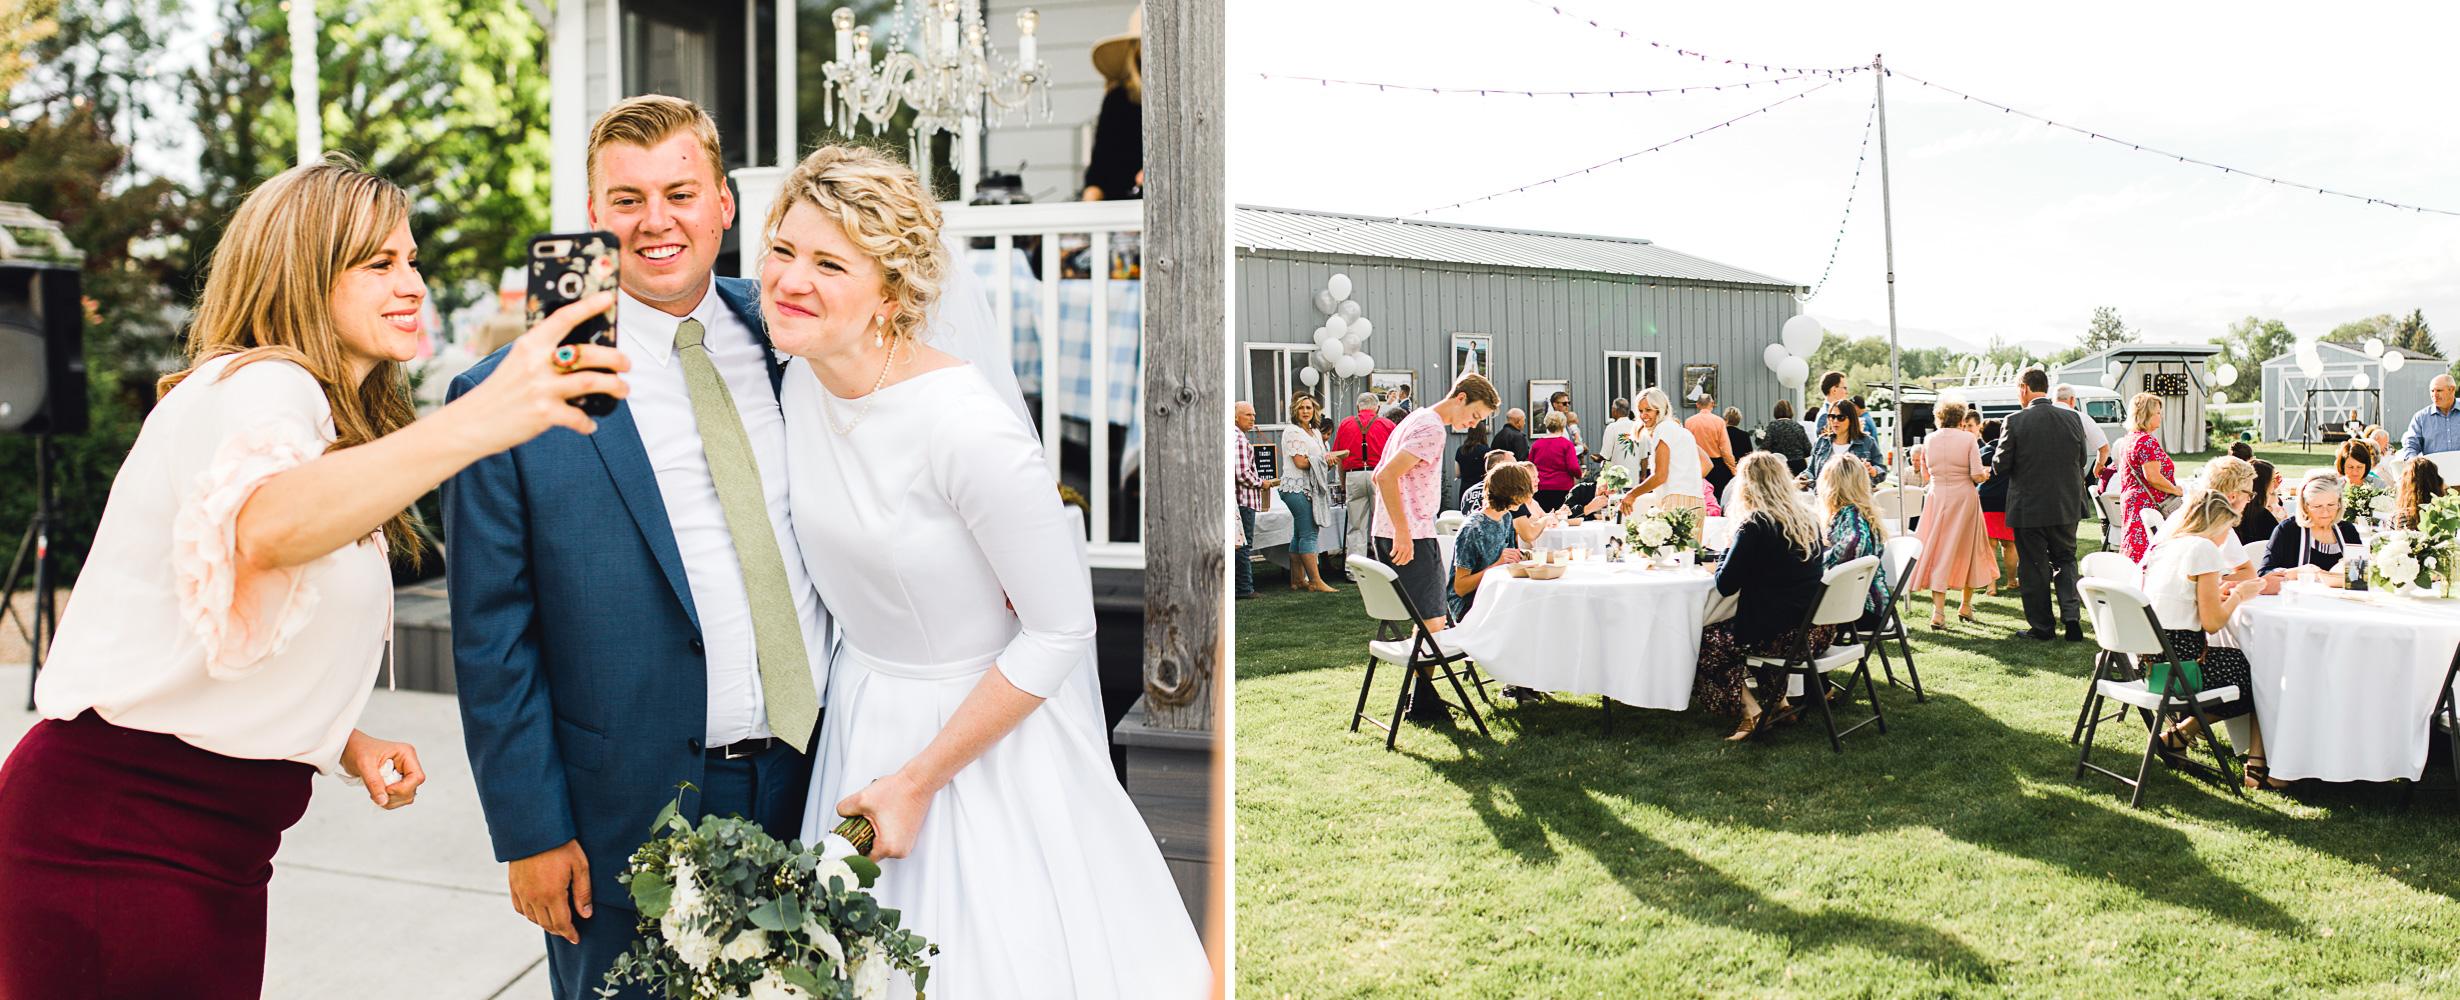 beautiful-outdoor-backyard-wedding-reception-anna-christine-photography-rexburg-idaho-9.jpg